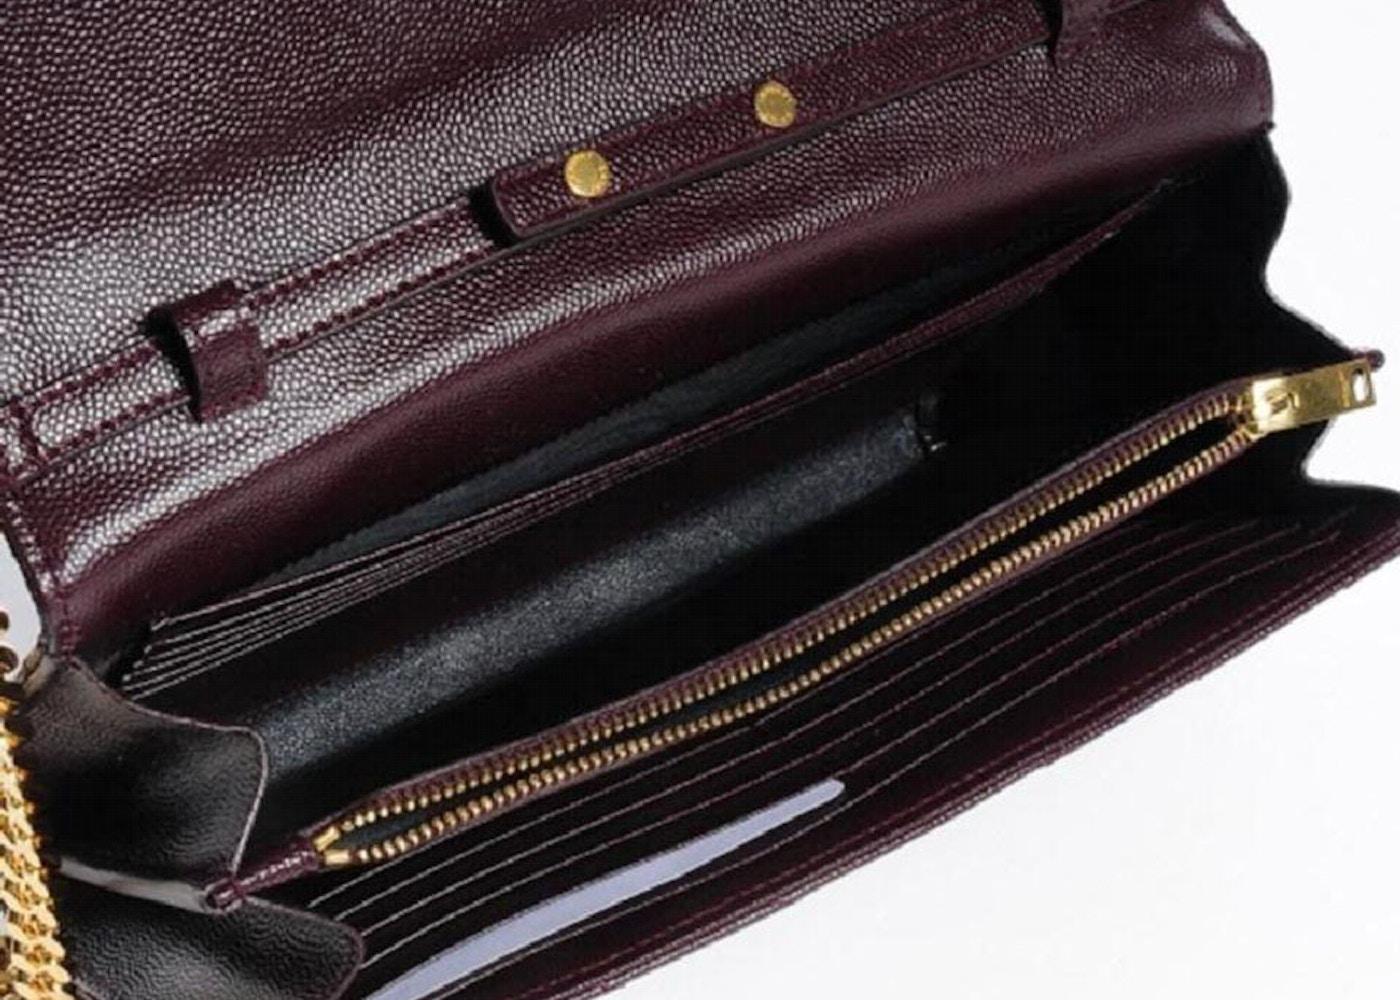 Saint Laurent Monogram Chain Wallet Large Matelasse Black